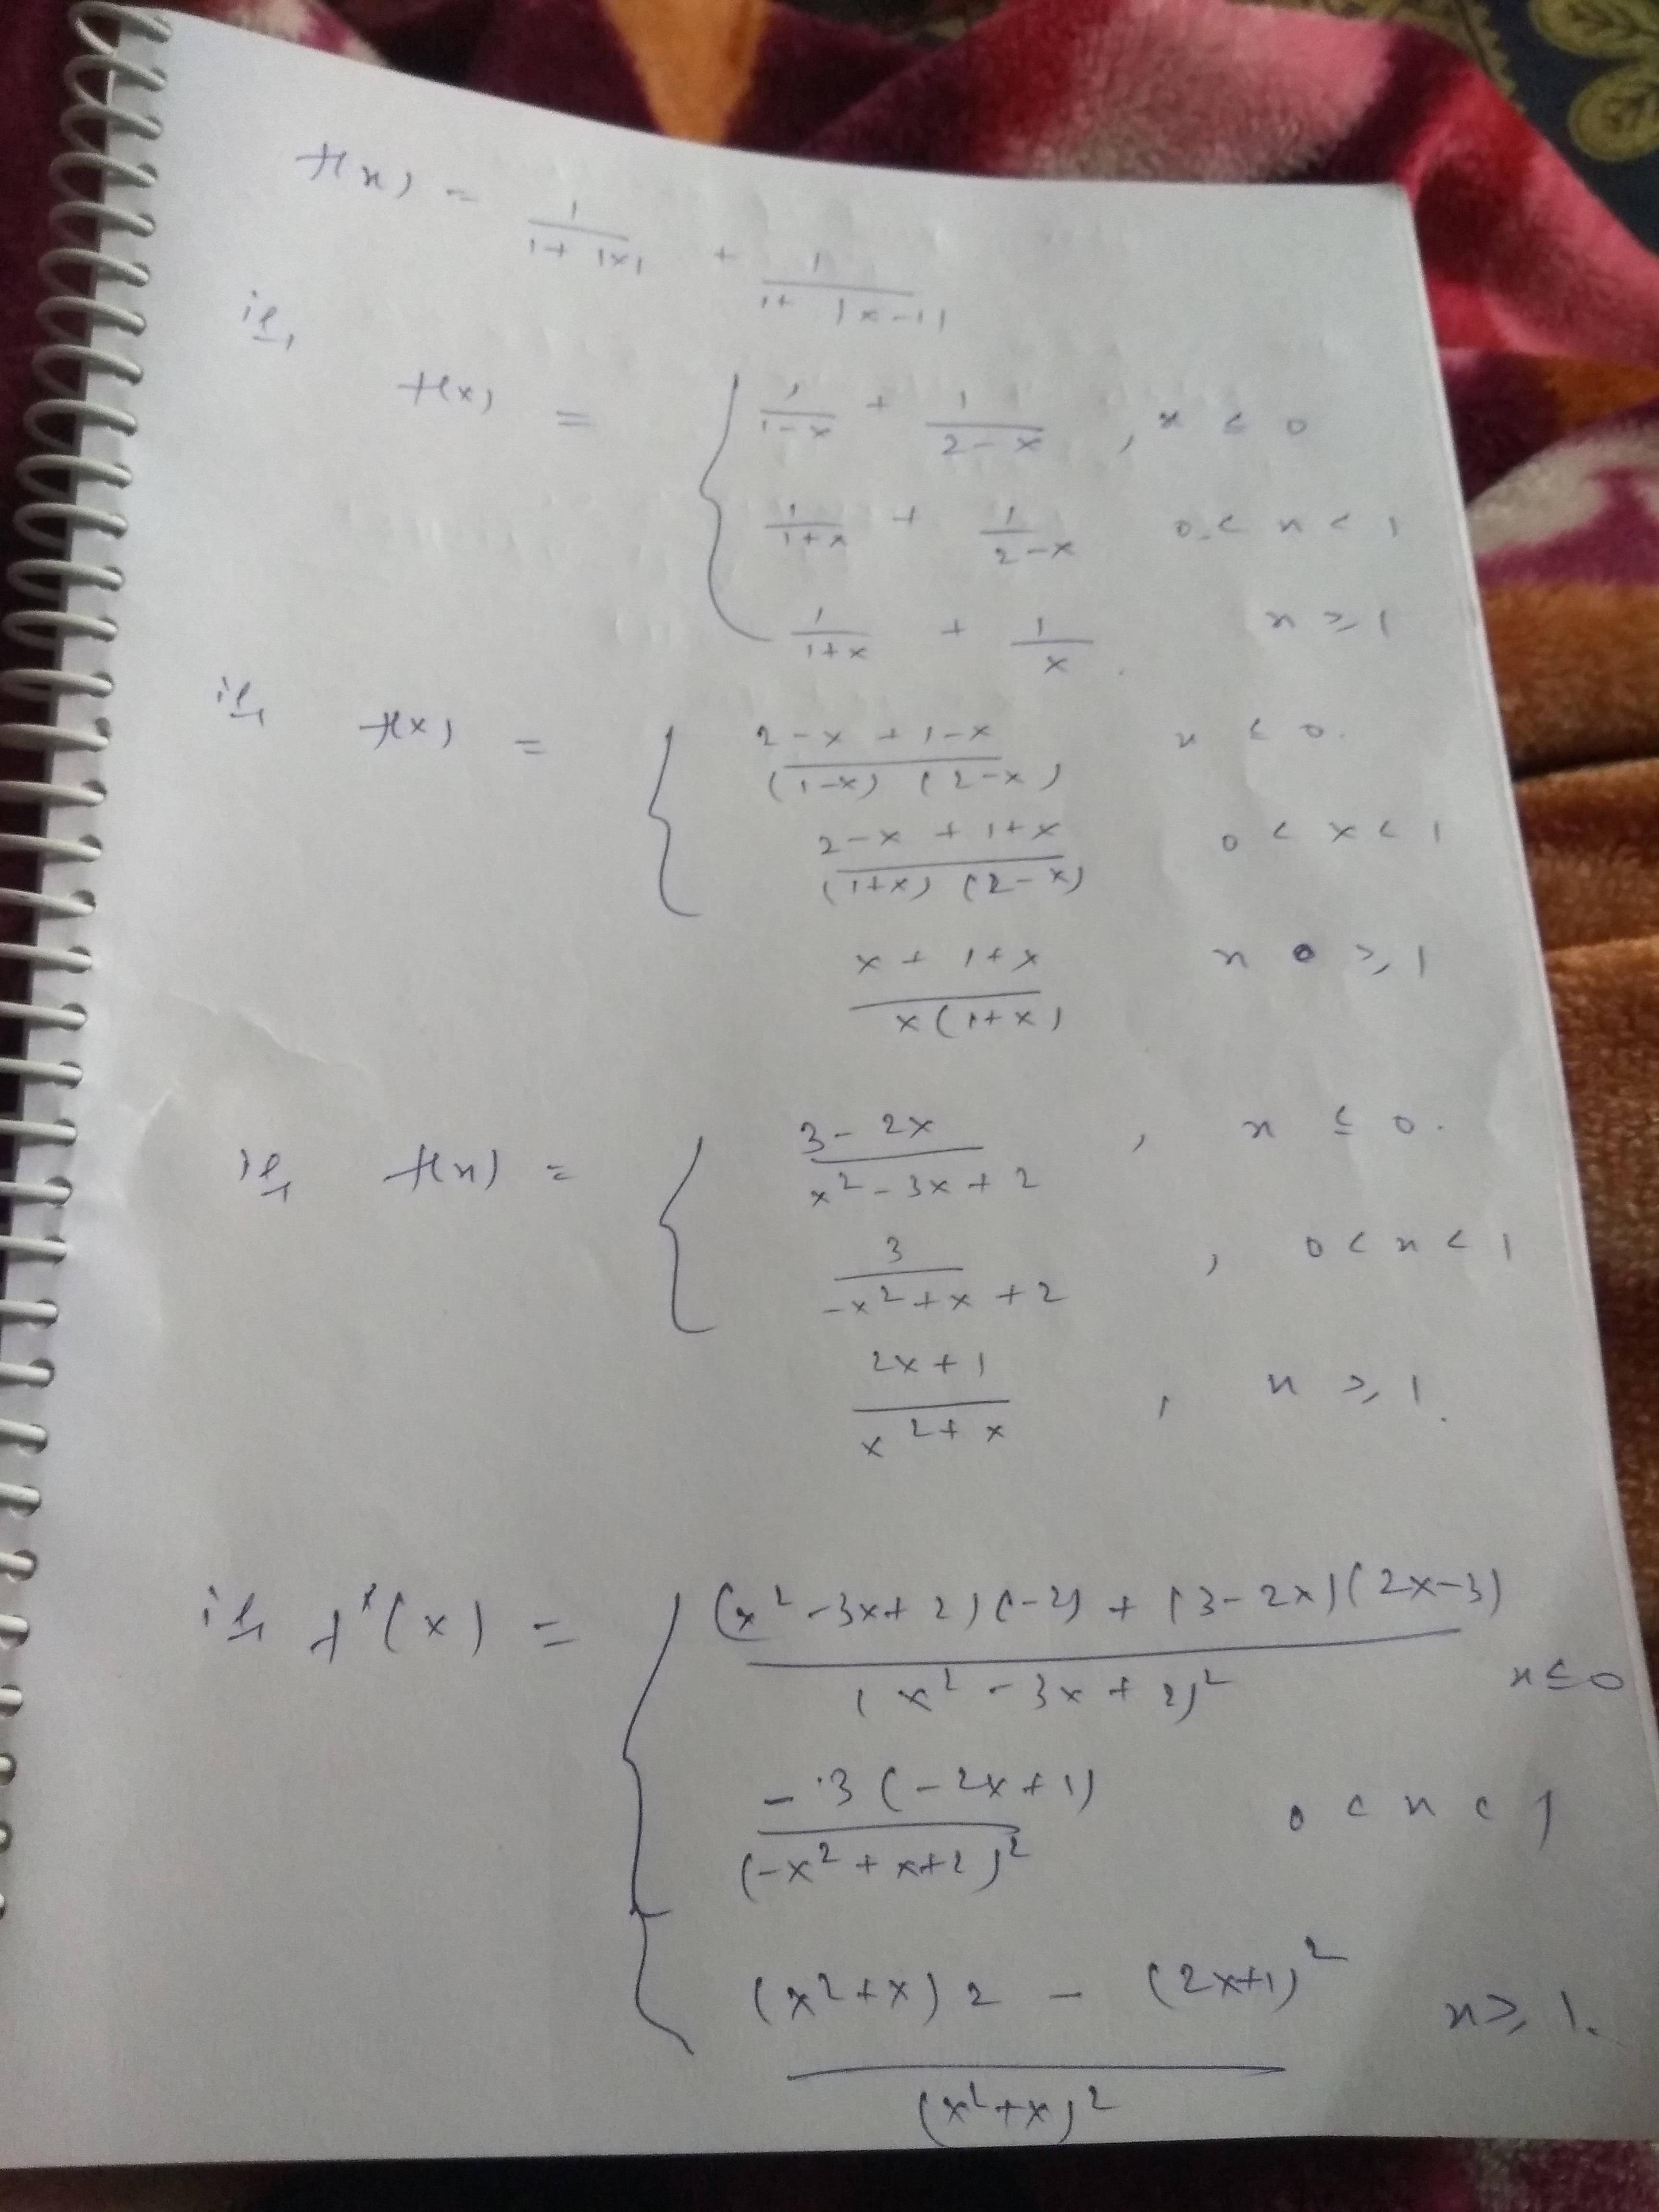 applications of derivatives maxima and minima problems